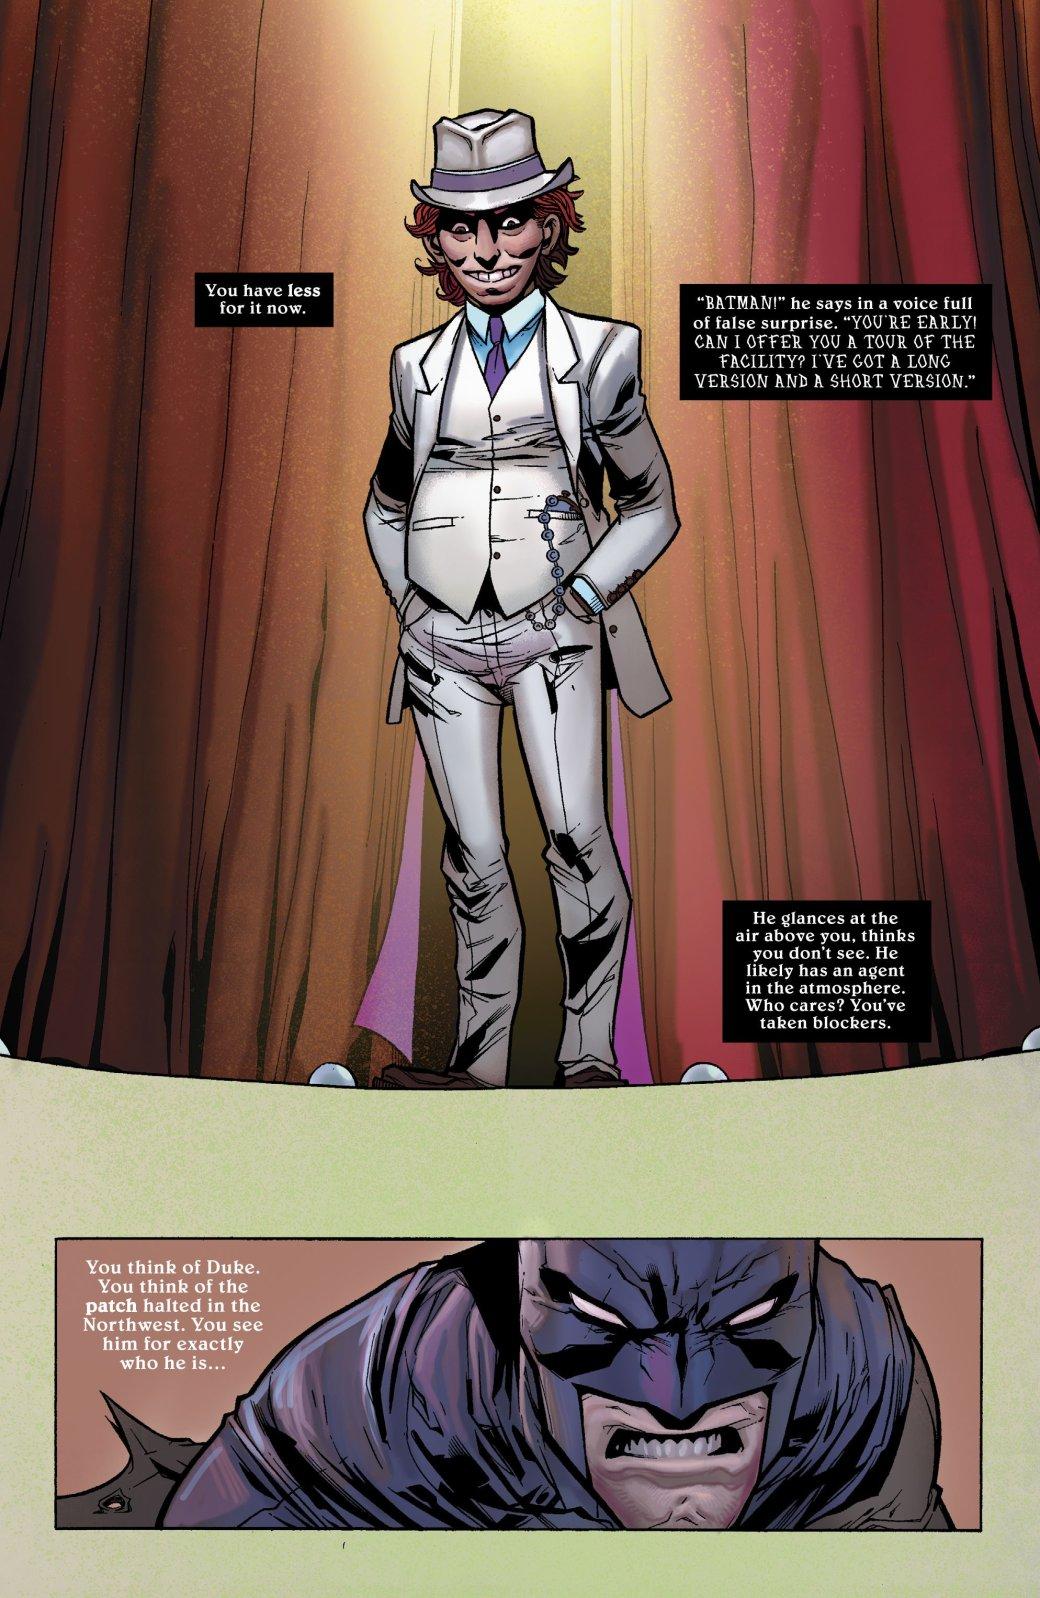 Бэтмен против Безумного Шляпника - Изображение 2